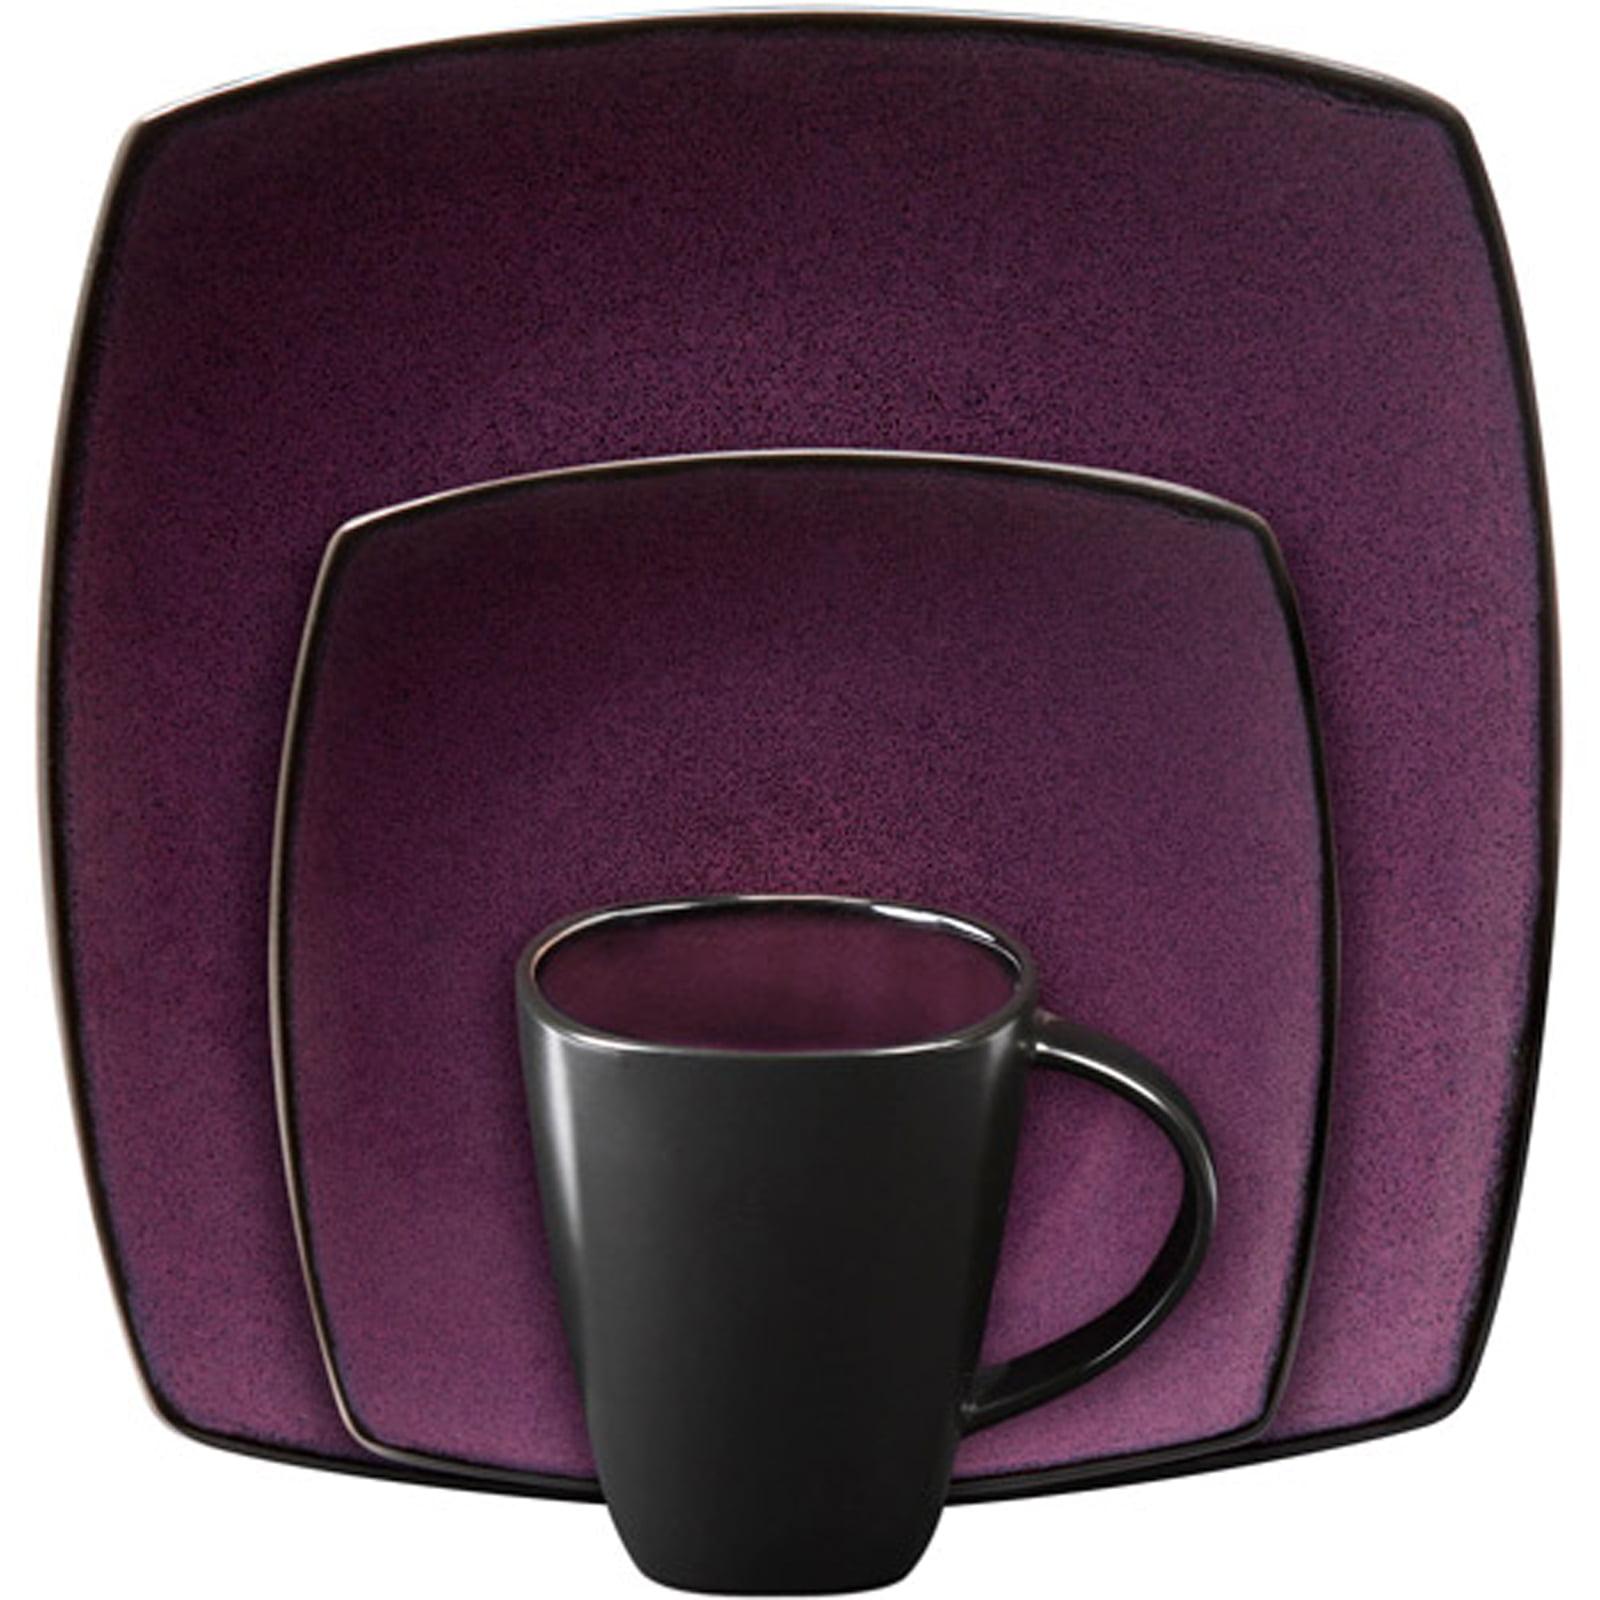 sc 1 st  Walmart & Gibson Soho Lounge Square 16-piece dinnerware set Purple - Walmart.com